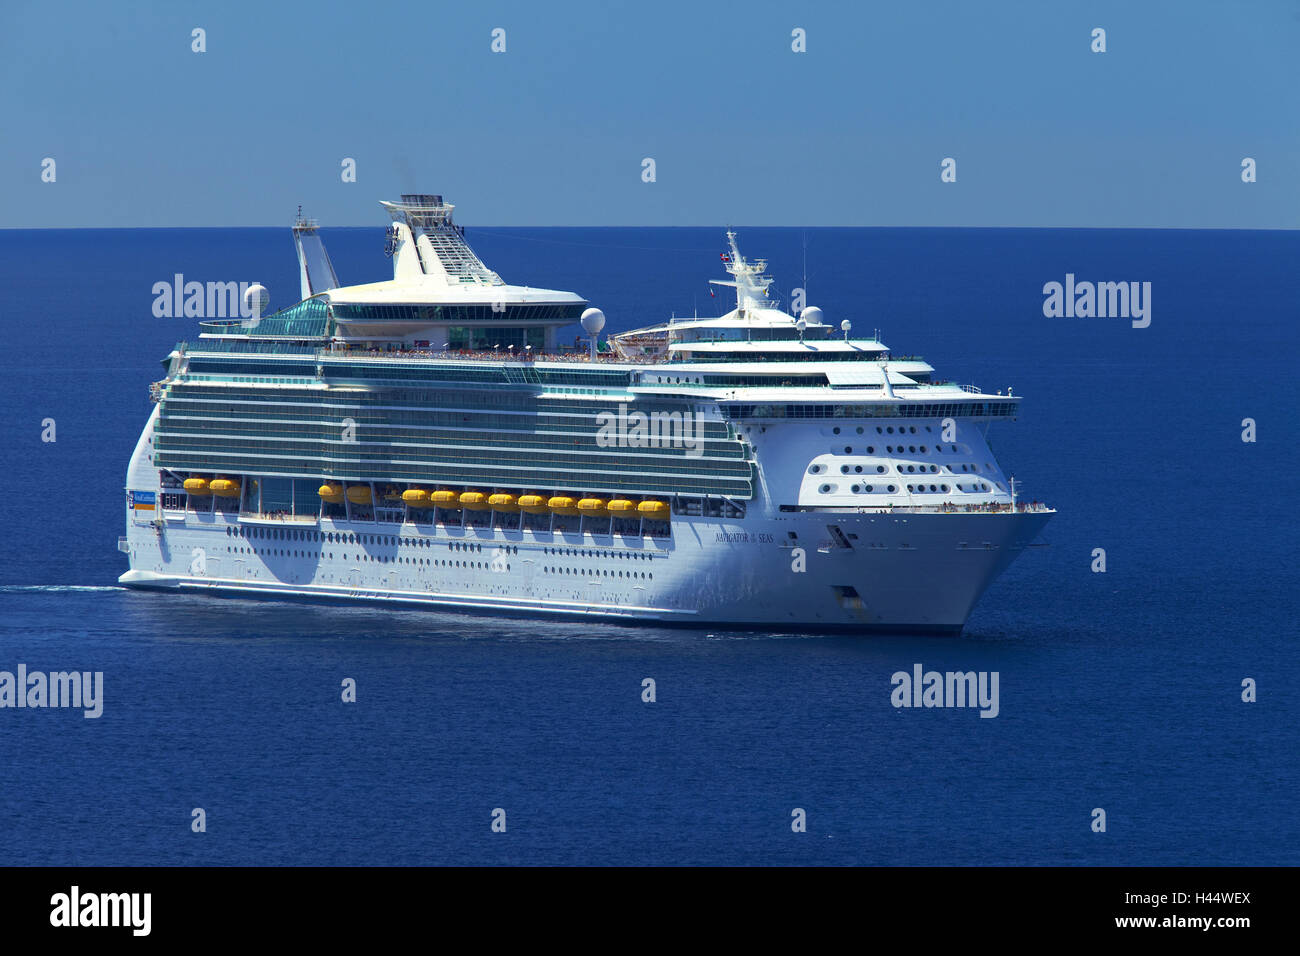 Europe, the South France, Cote d'Azur, Nice, cruise ship 'navigator the Seas', - Stock Image